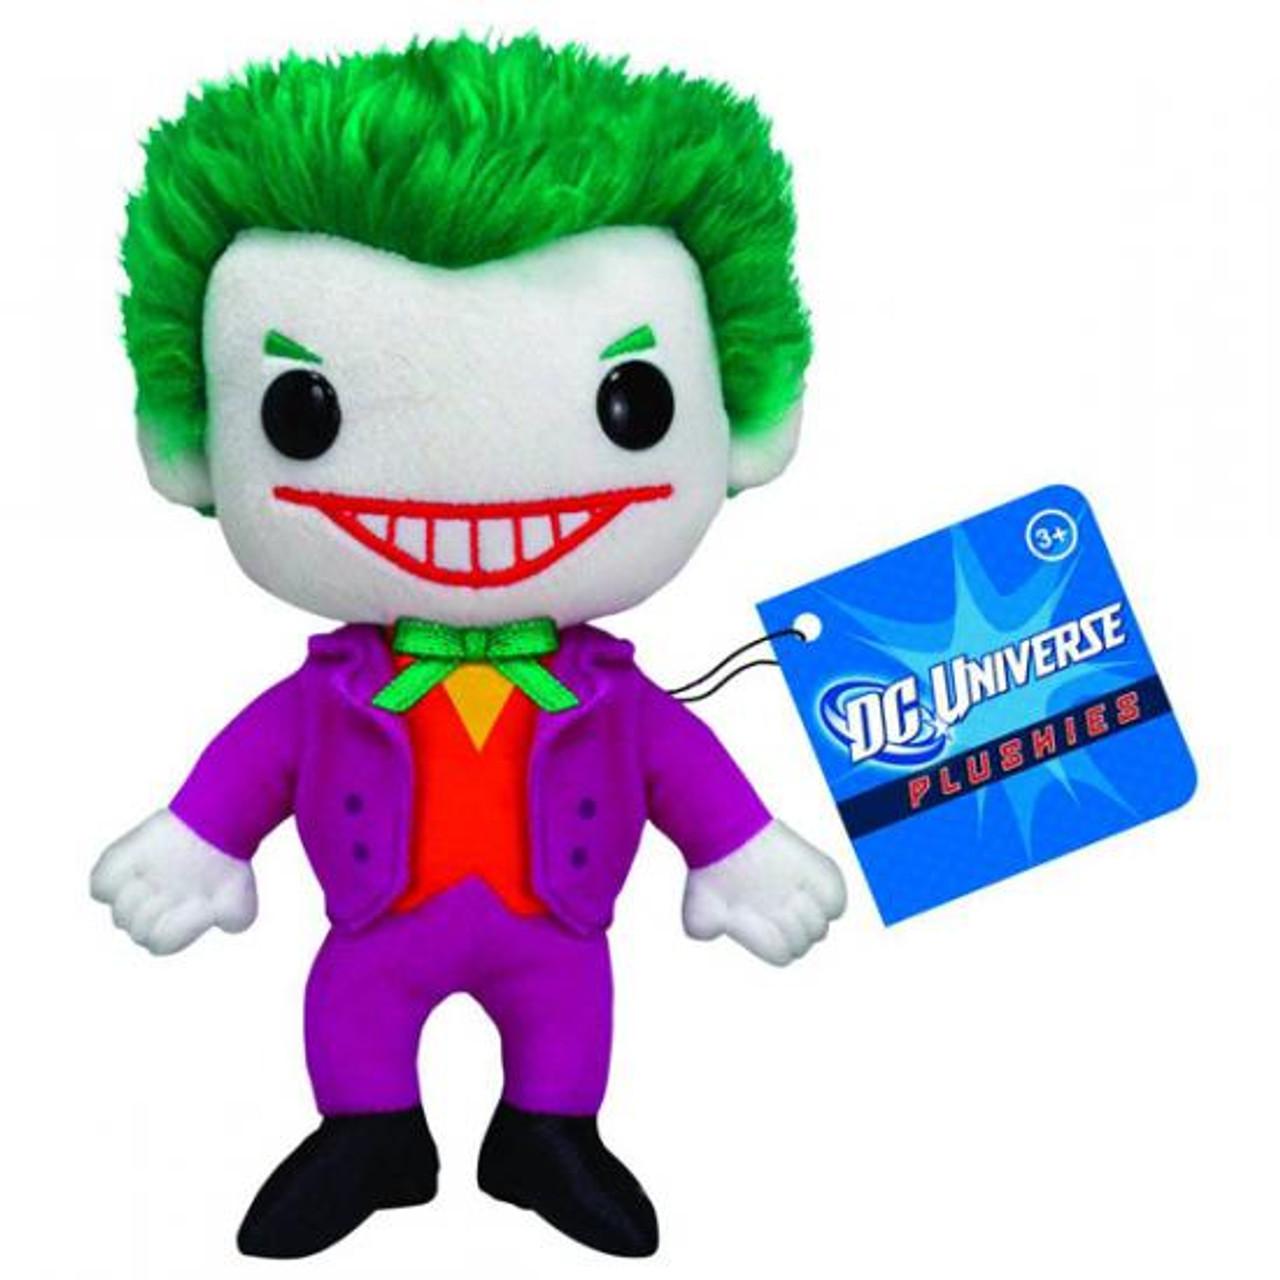 Funko DC Universe The Joker 5-Inch Plushie